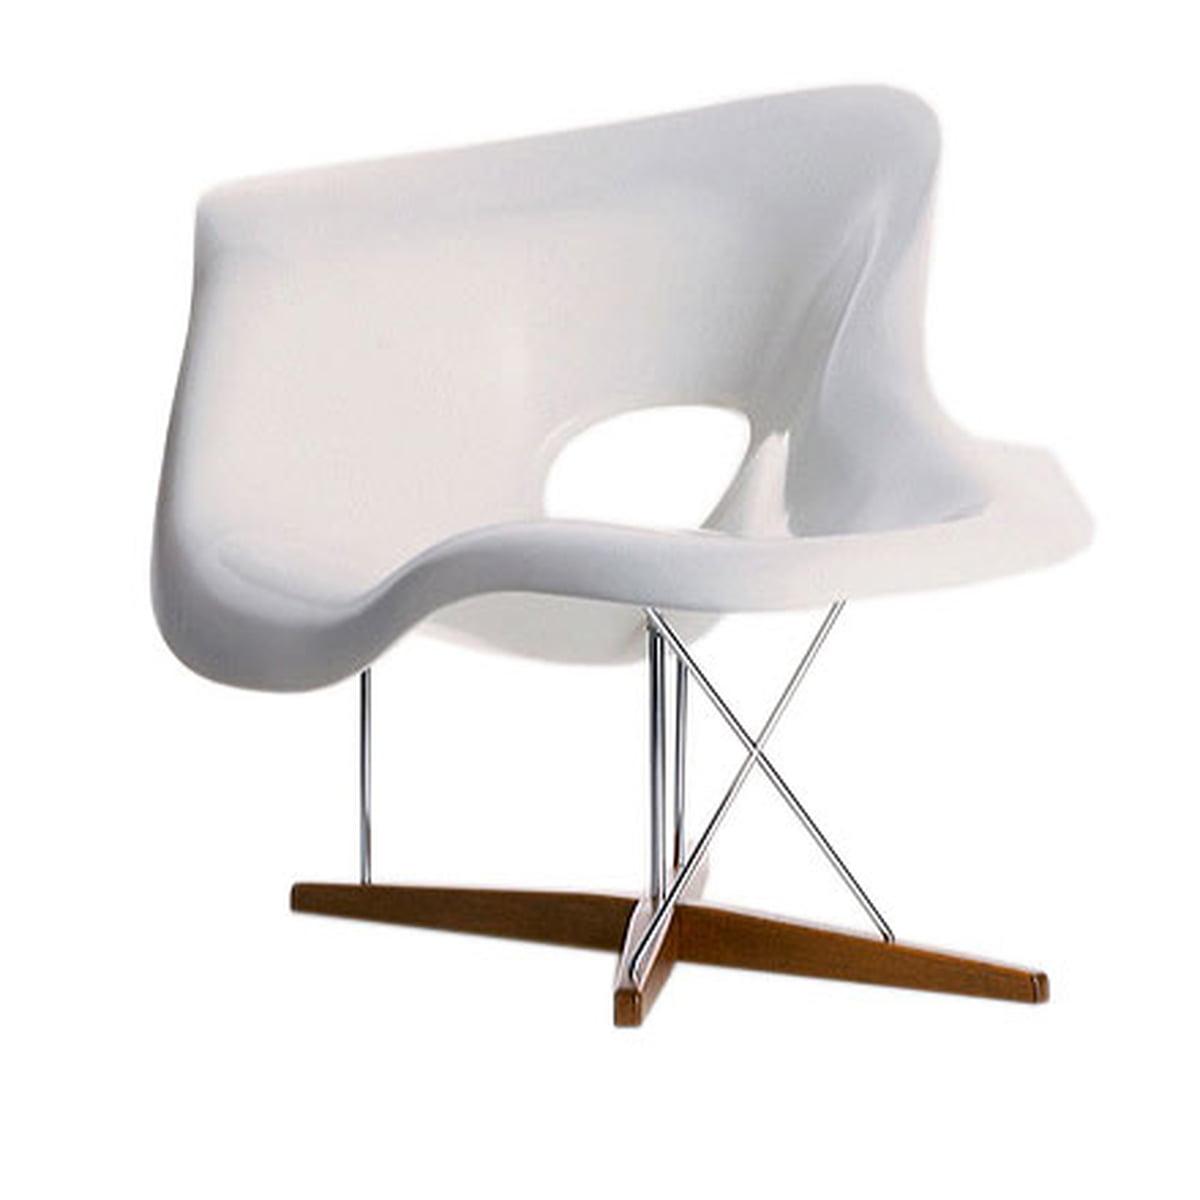 la chaise vitra boutique. Black Bedroom Furniture Sets. Home Design Ideas